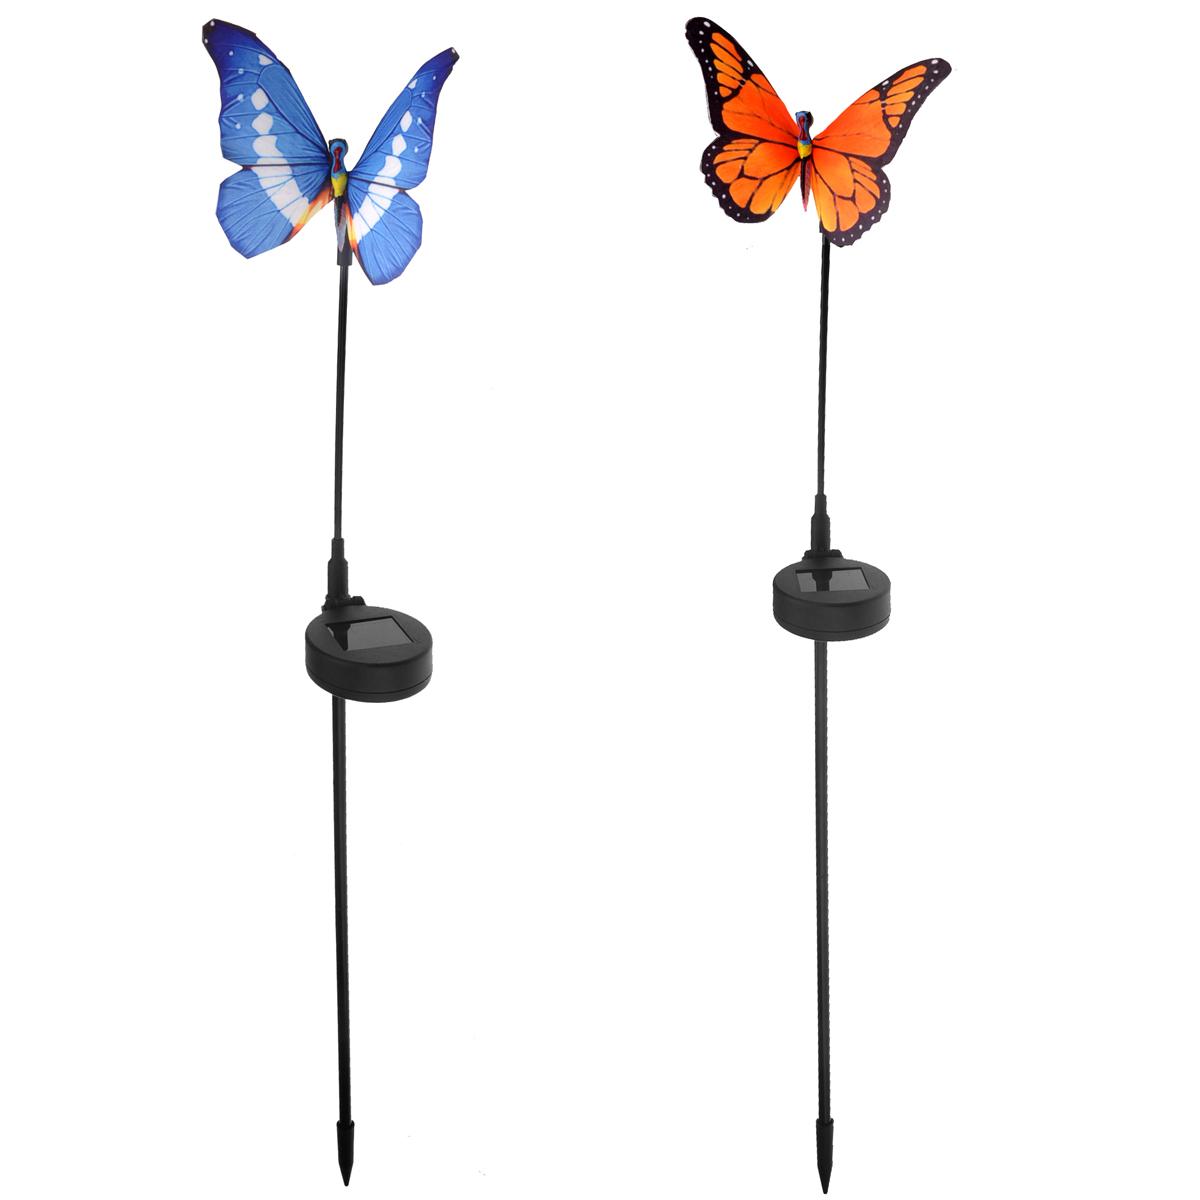 2pcs Waterproof Solar Power RGB Color-changing LED Fiber Optic Butterfly Lights LED Garden Lamps (Random Color)